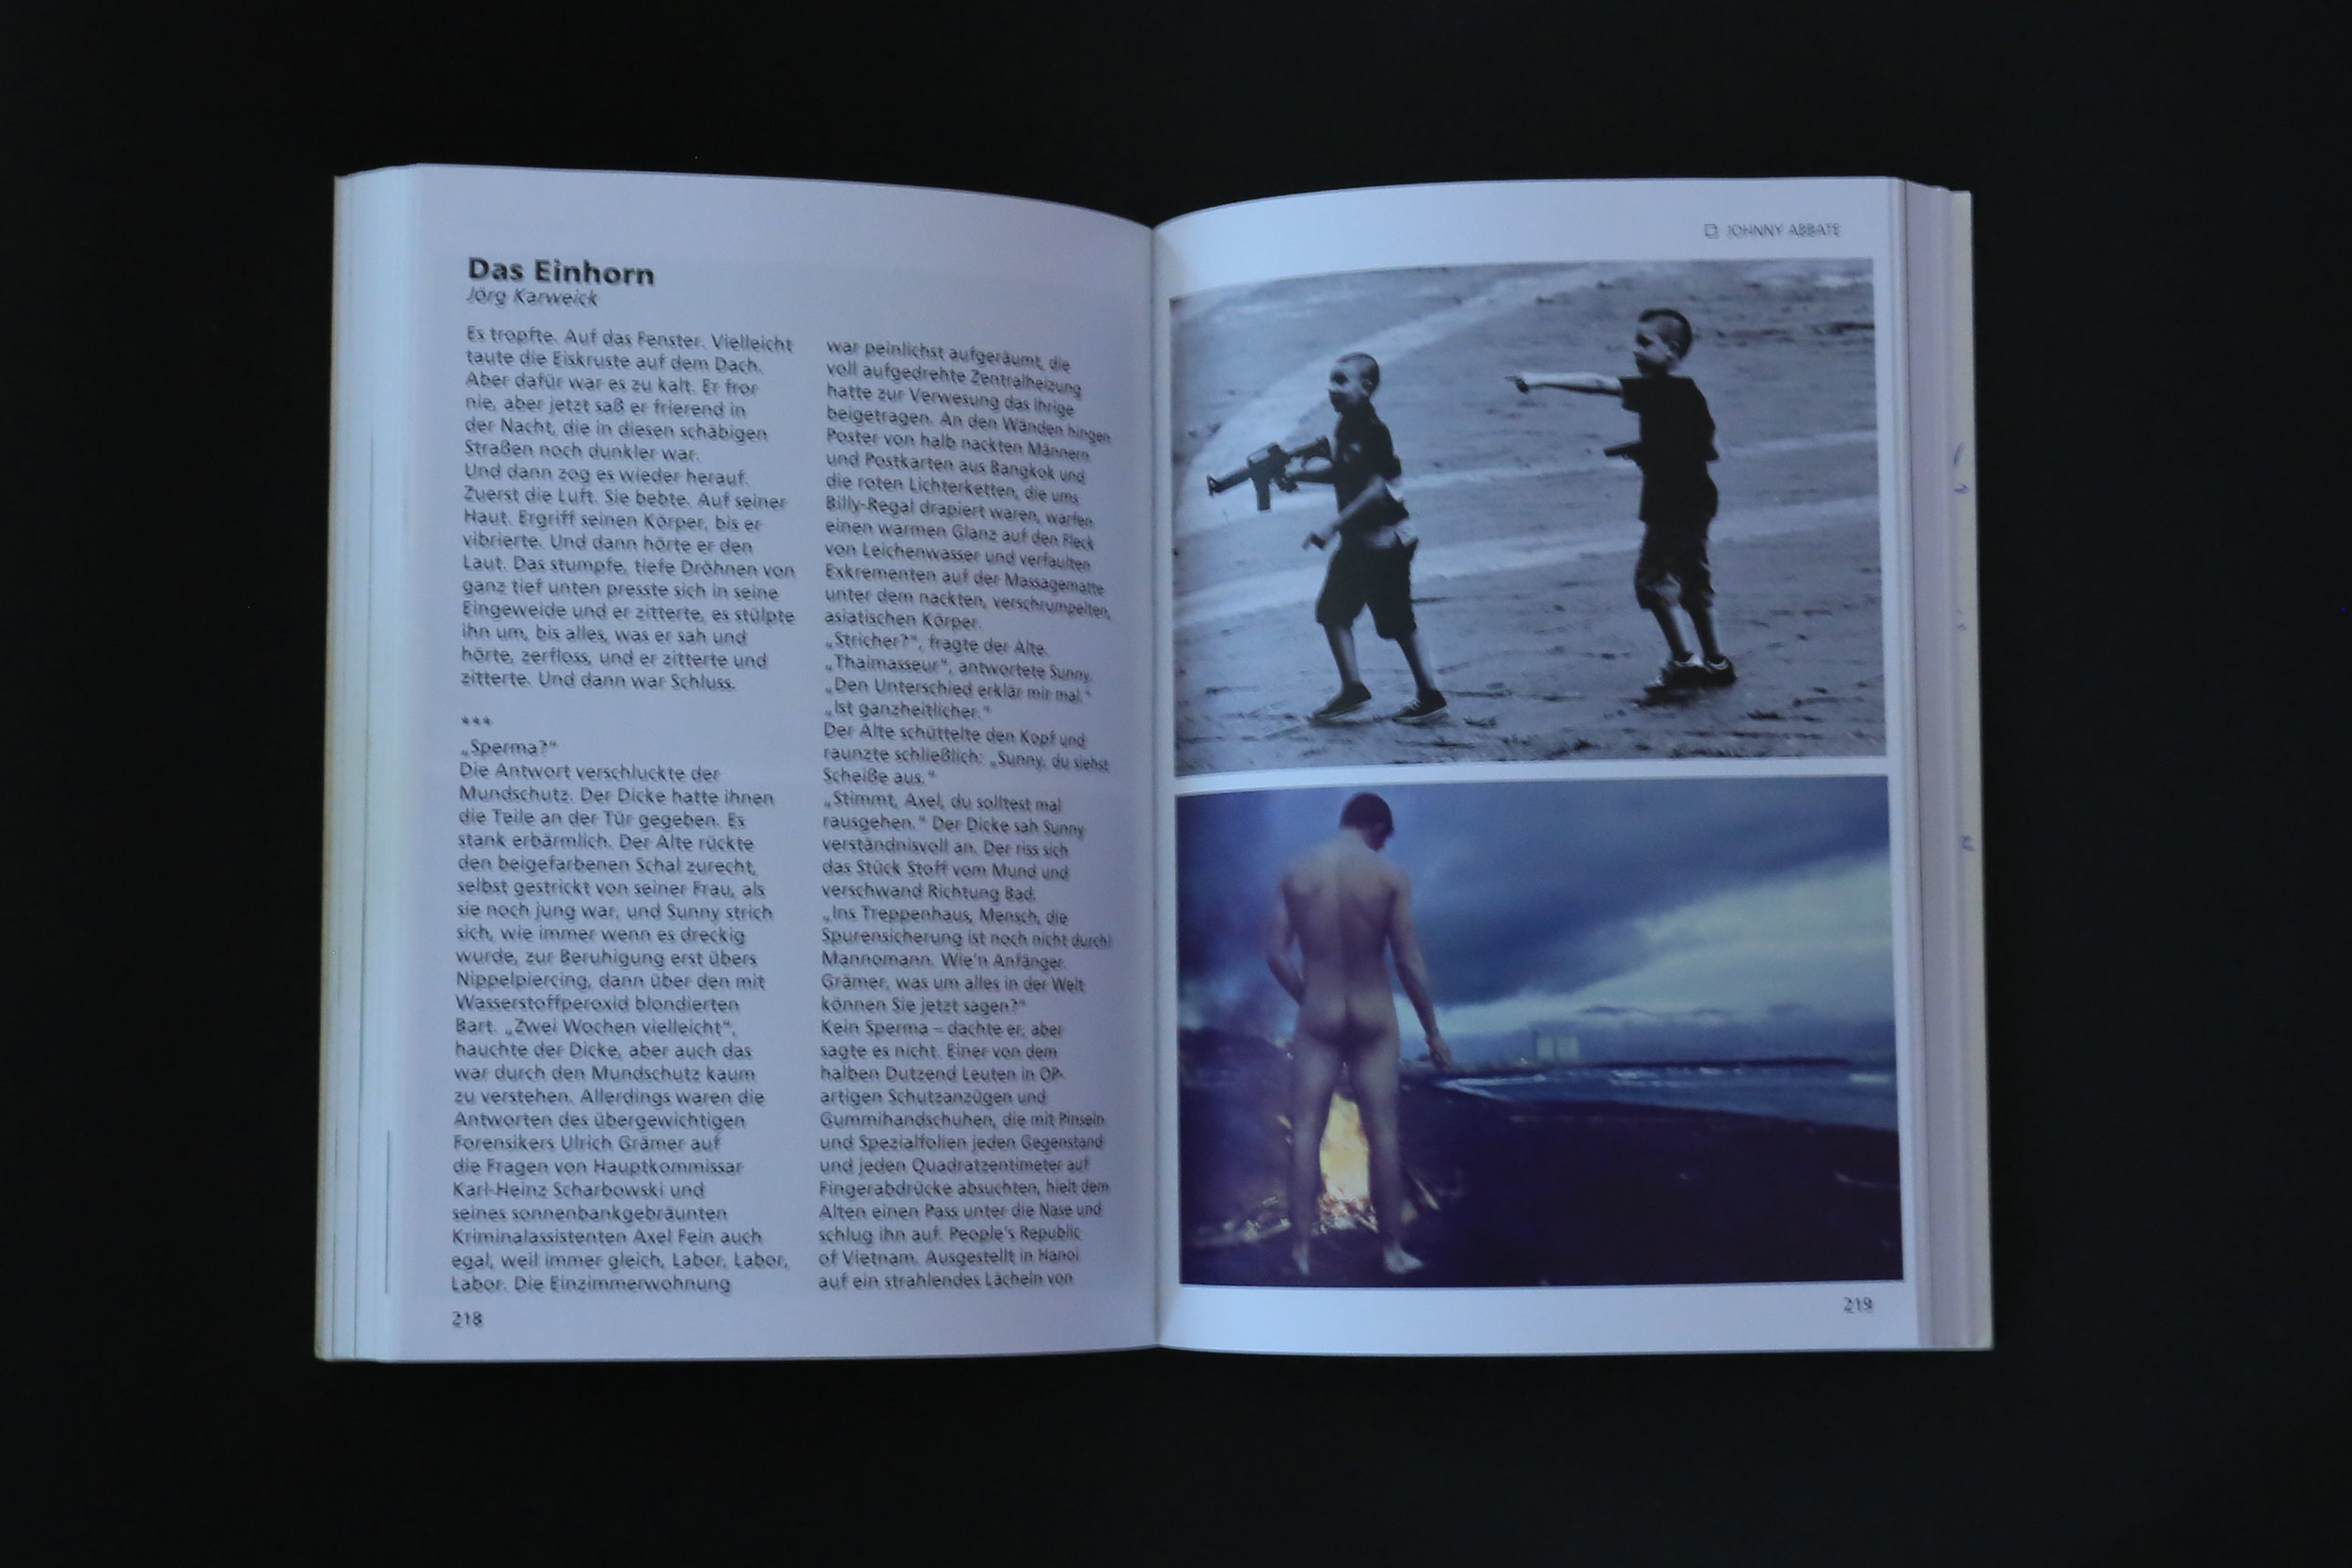 Mein Schwules Auge 8    Edited by Rinaldo Hopf and Axel Schock.    Konkursbuch Verlag Claudia Gehrke, Berlin, 2011    pp 215-221 Deutsch.   https://www.amazon.de/Mein-schwules-Auge-schwule-Jahrbuch/dp/3887693981